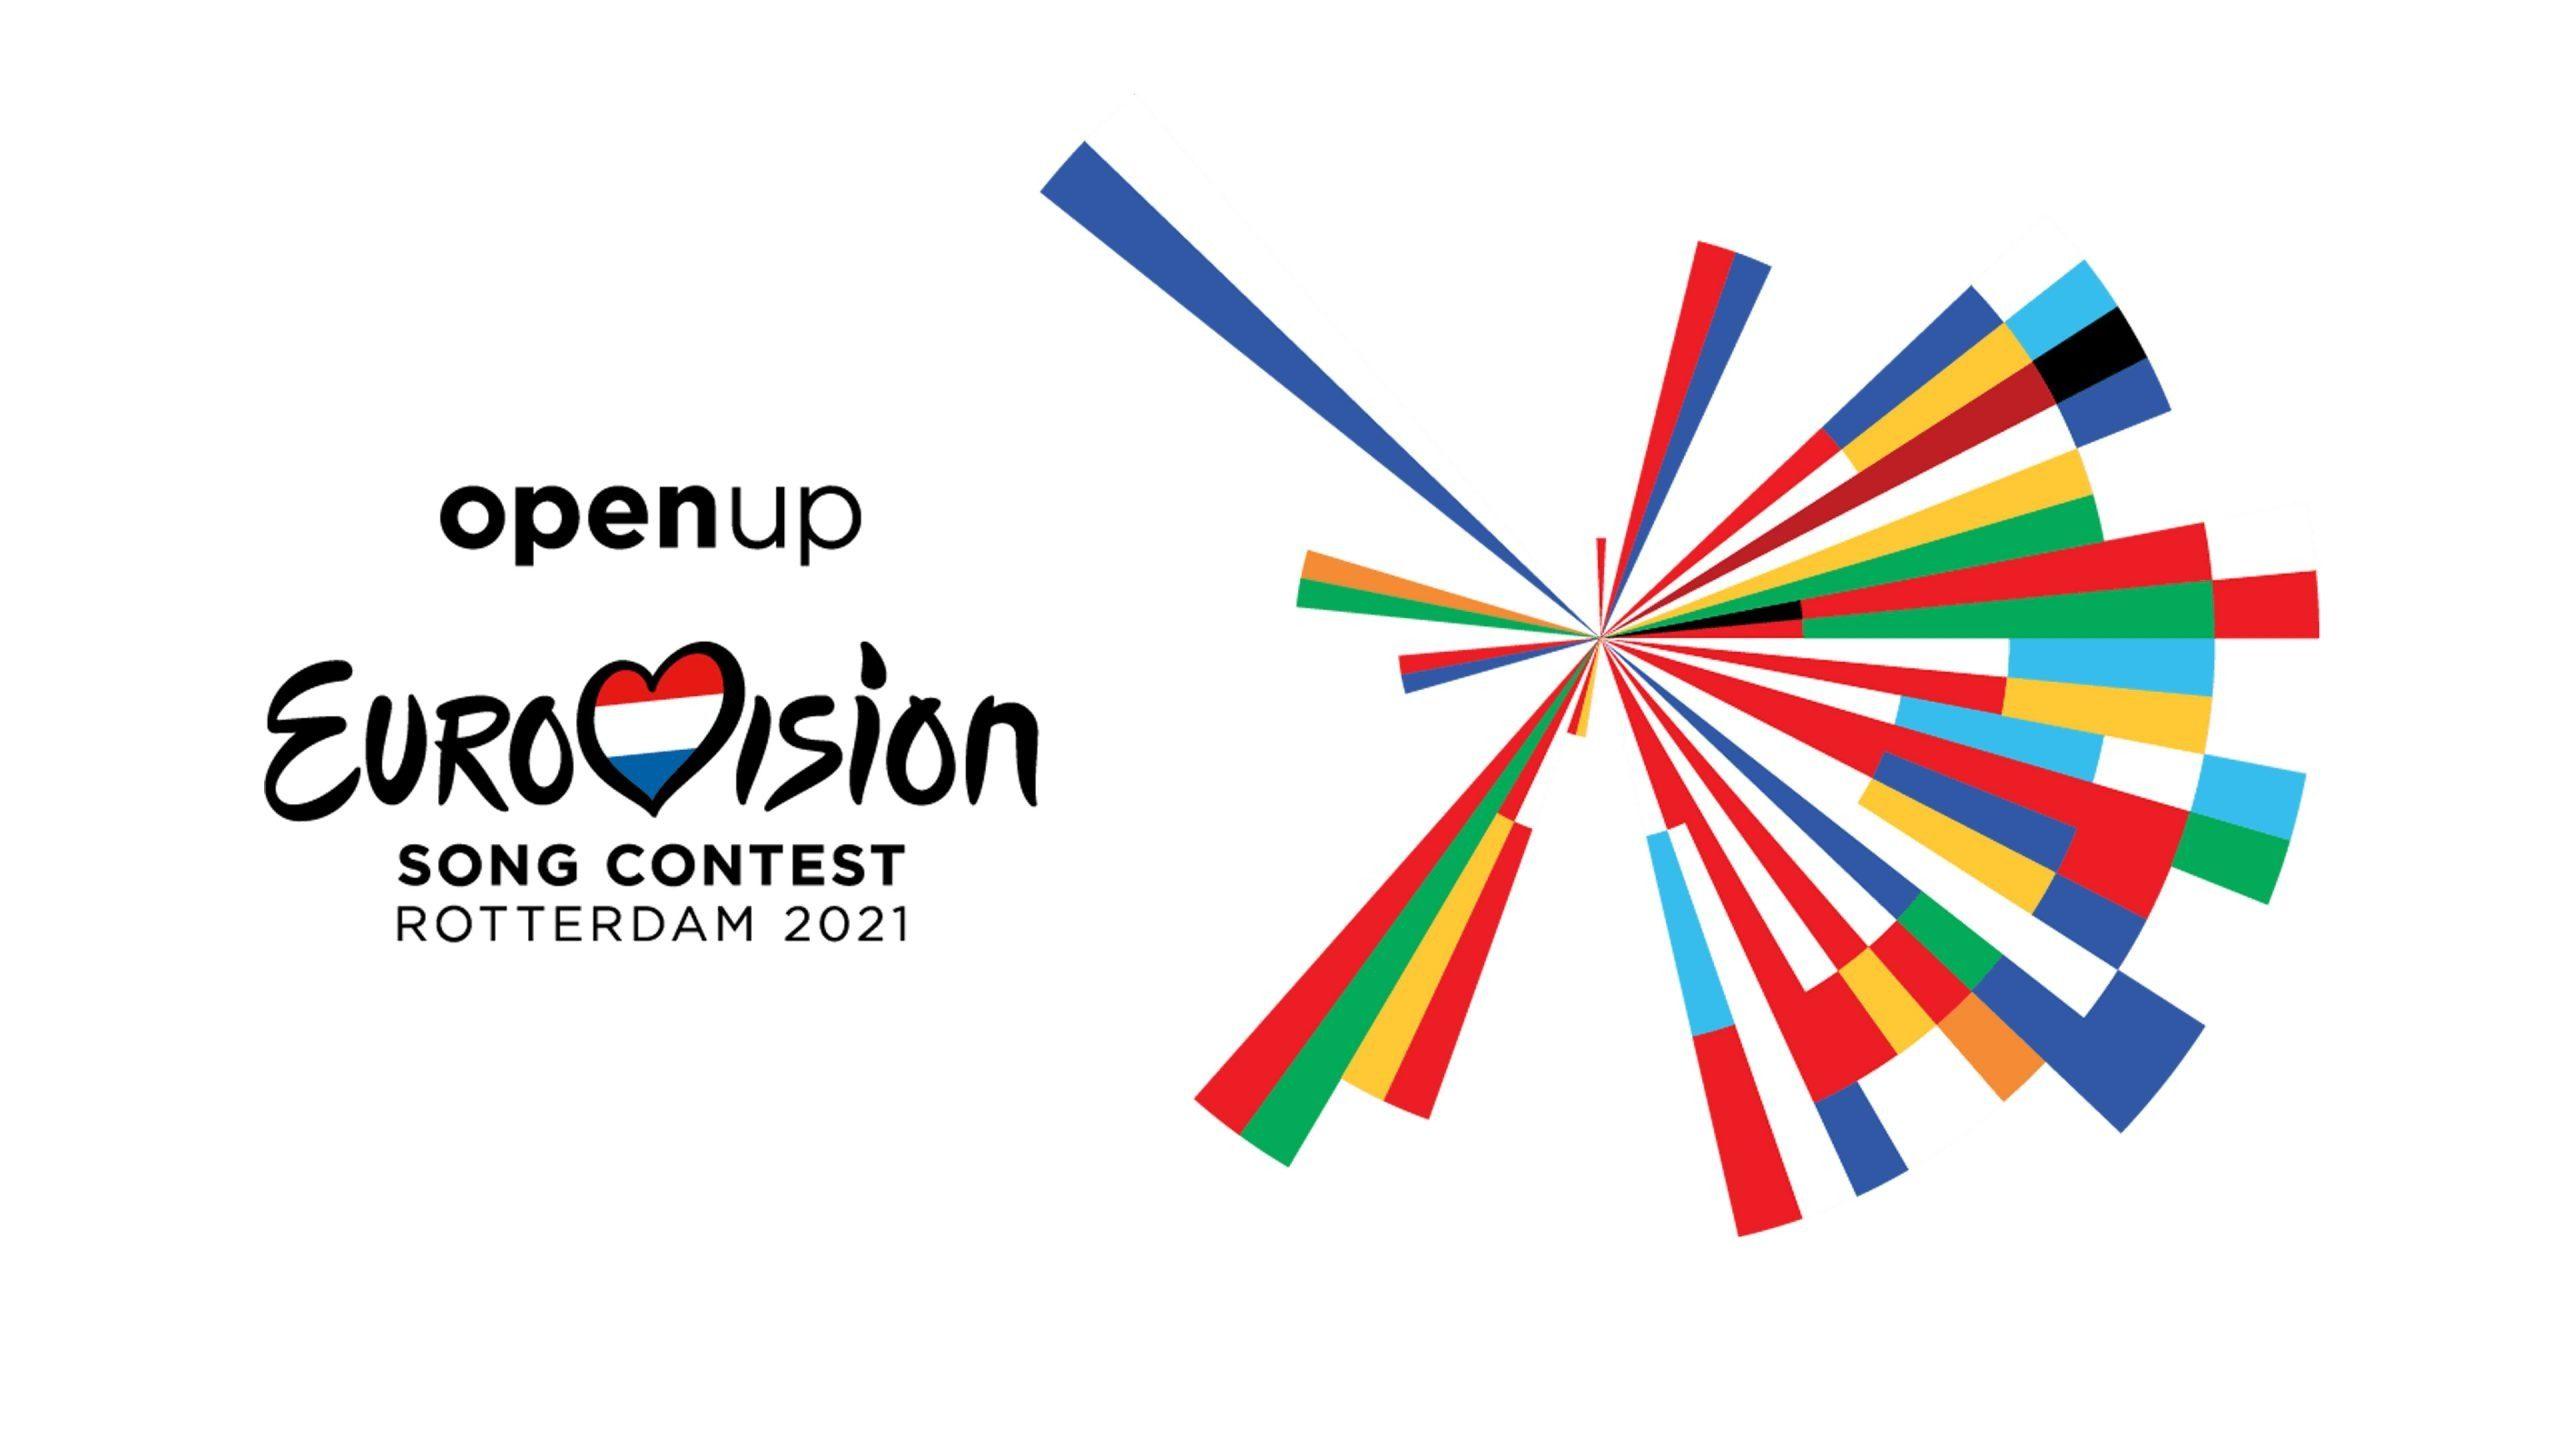 eurovision 2021 logo roterdam rotterdam open up